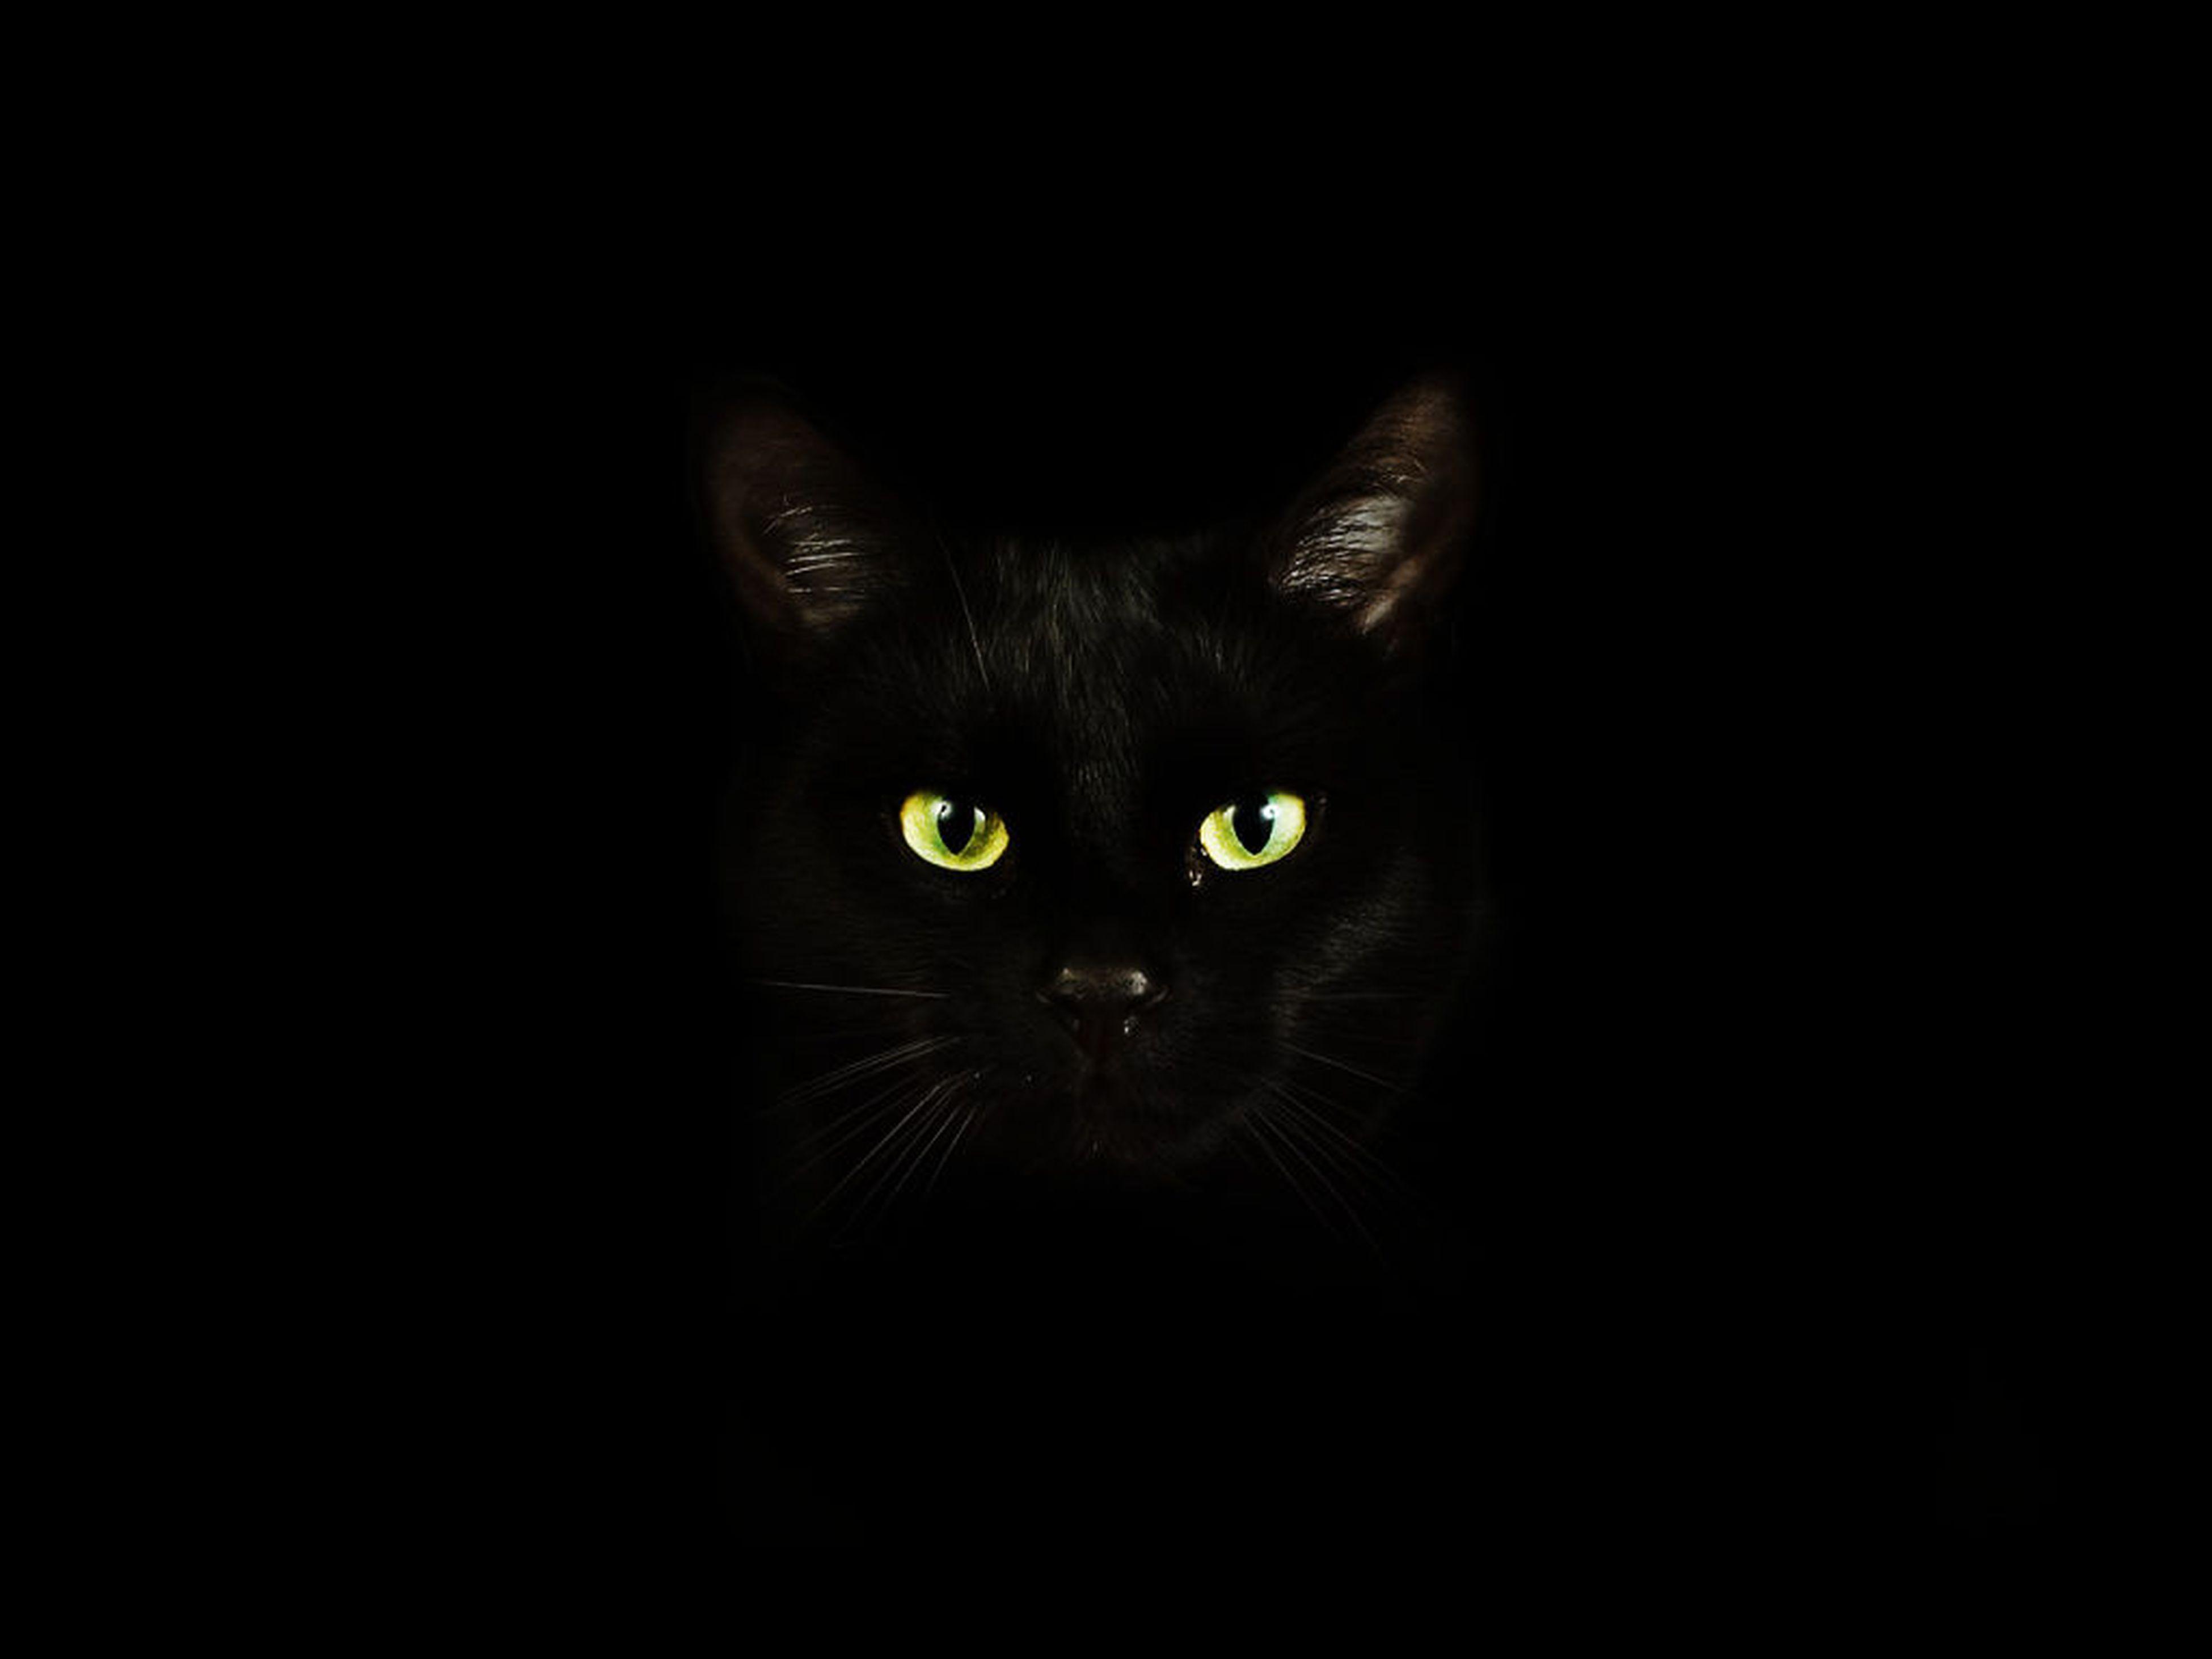 pets, domestic animals, one animal, portrait, indoors, looking at camera, domestic cat, cat, animal themes, black background, studio shot, staring, mammal, feline, black color, dark, copy space, close-up, darkroom, animal head